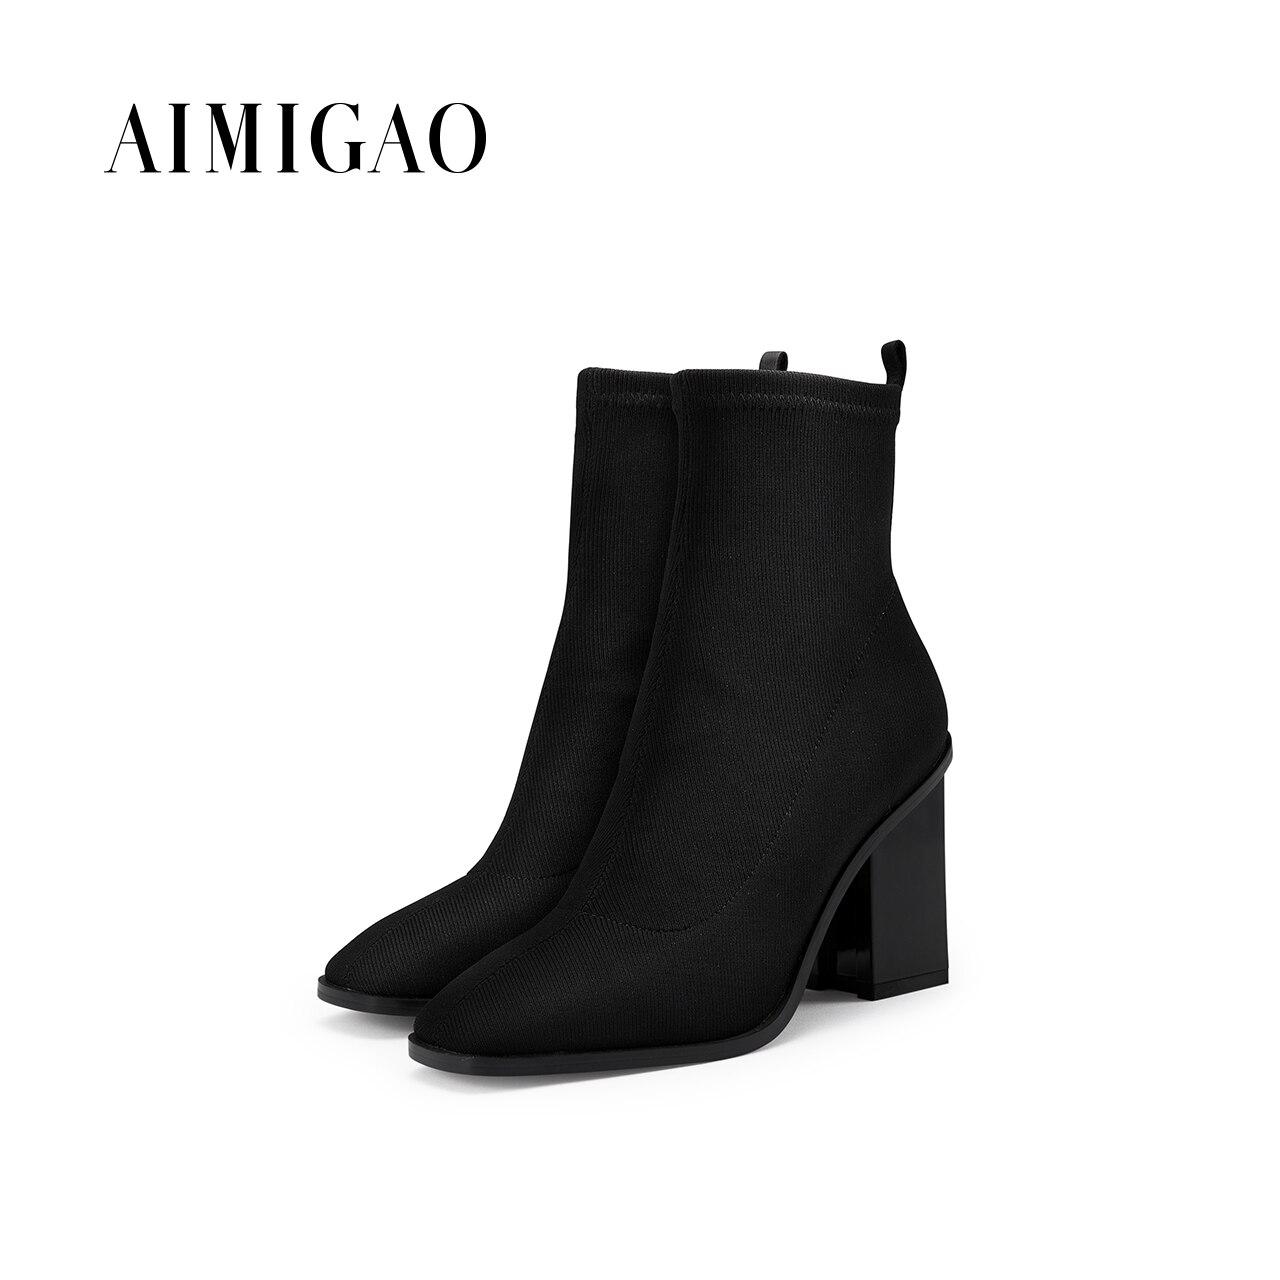 AIMIGAO European American Fashion square toe thick high heel ankle boots fashion socks boots female 2017 autumn winter new